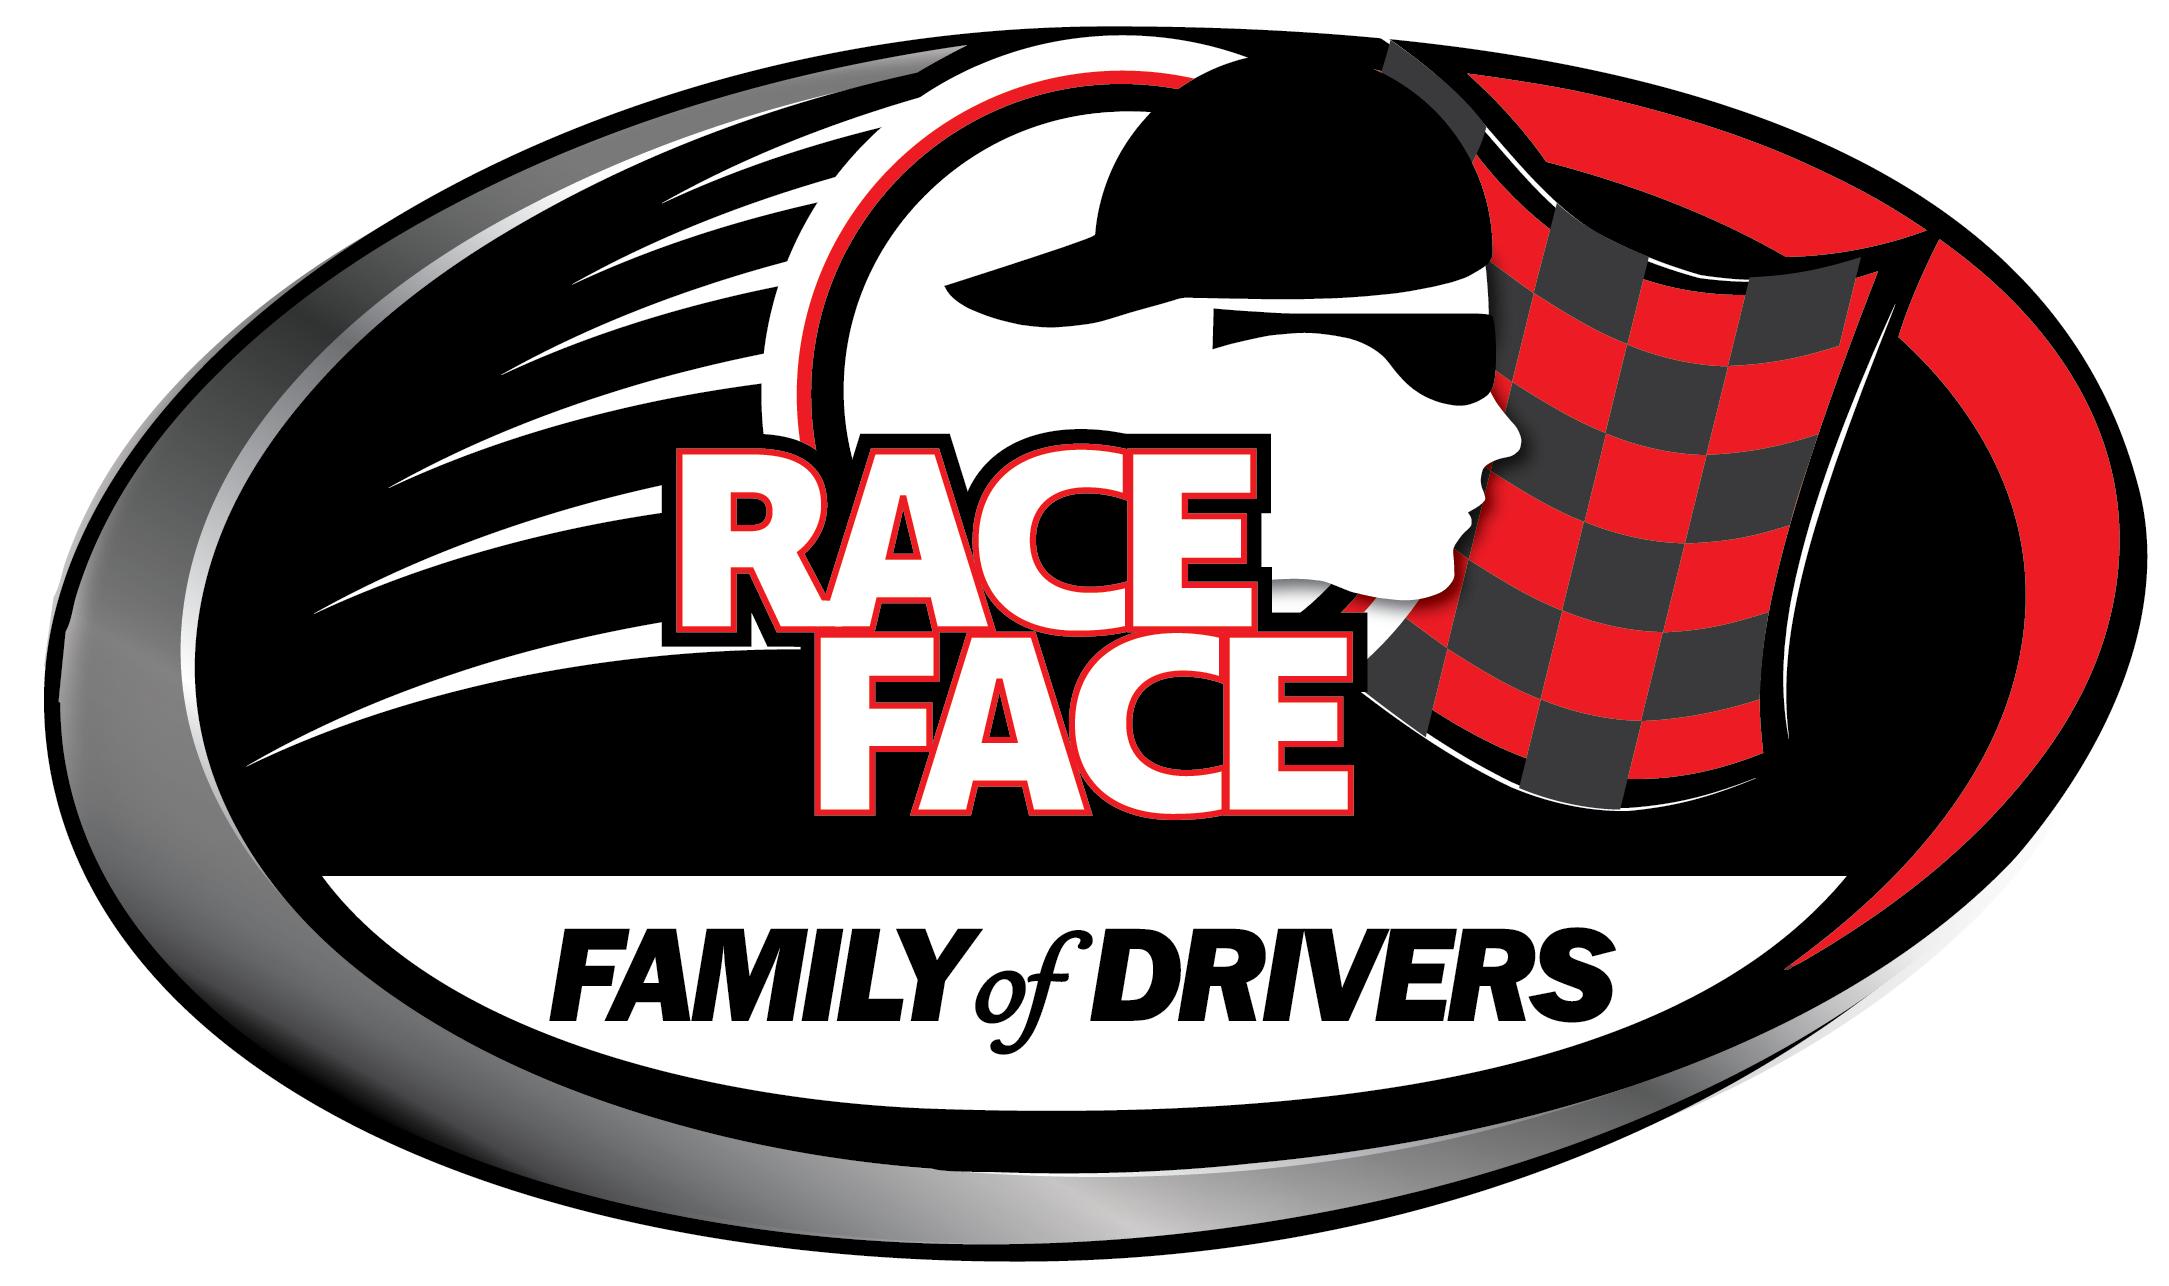 Race Face FAMILY drivers logo